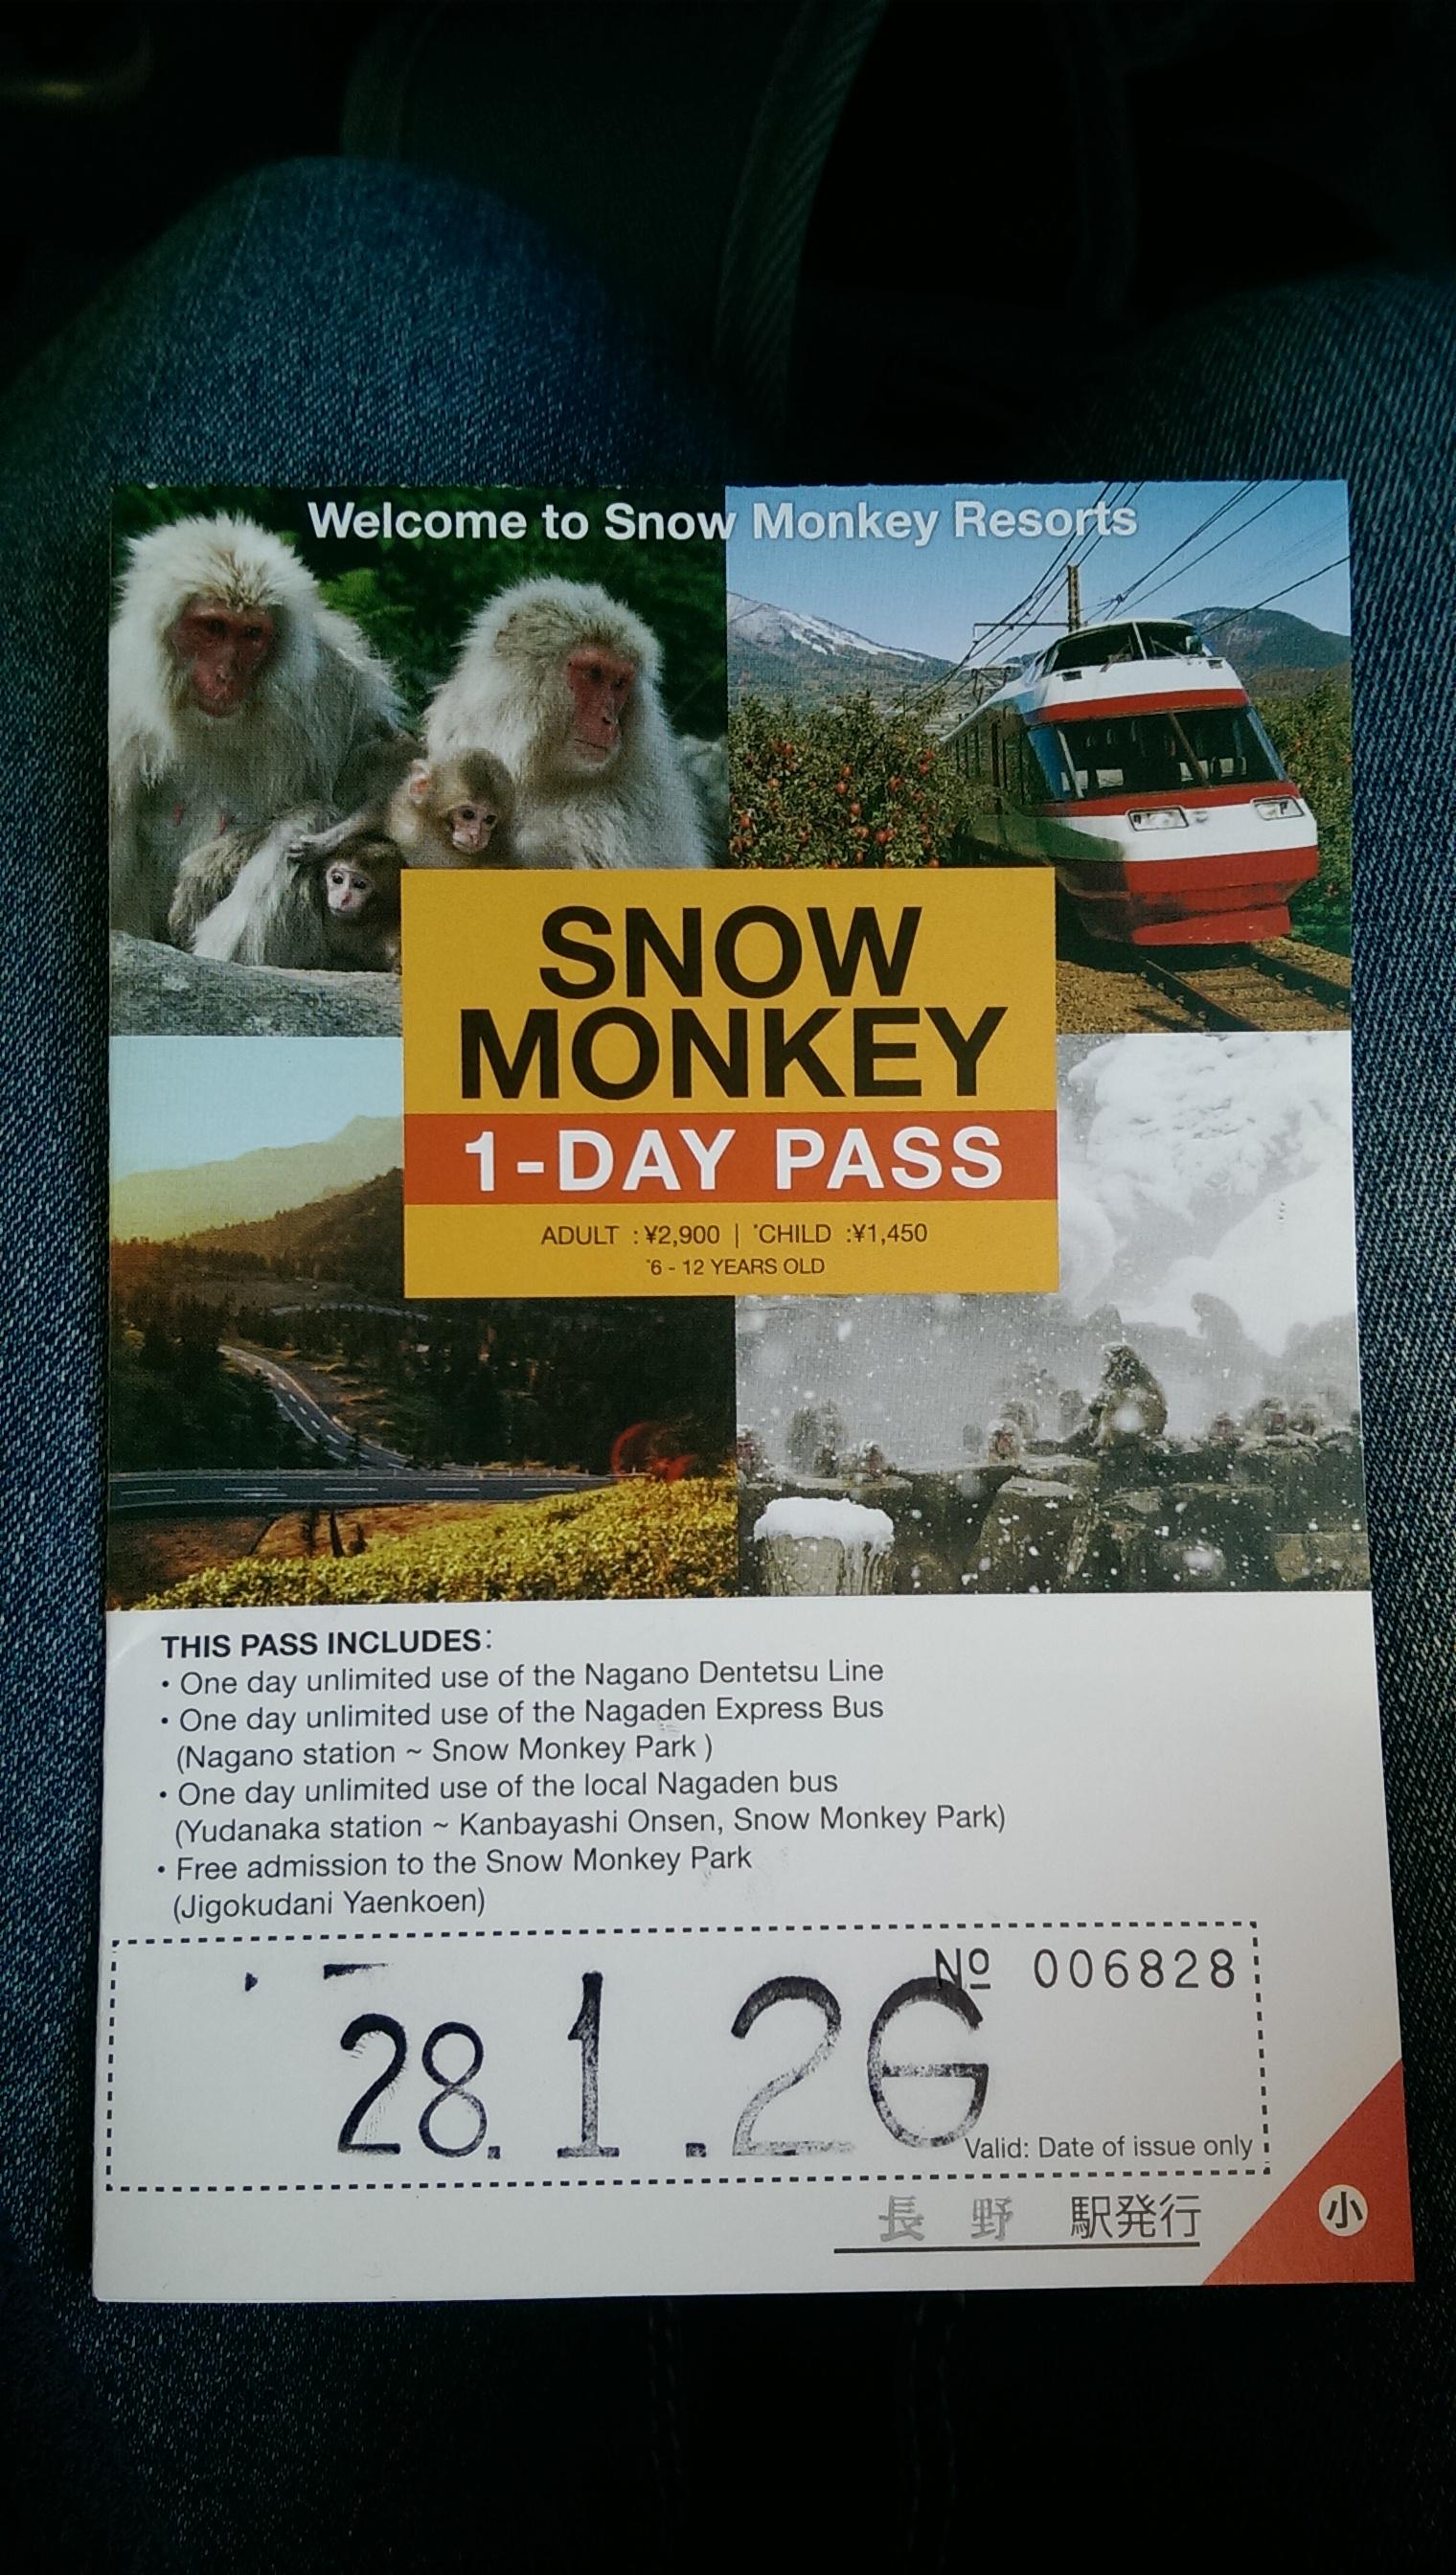 Nagano snow monkeys Jigokudani